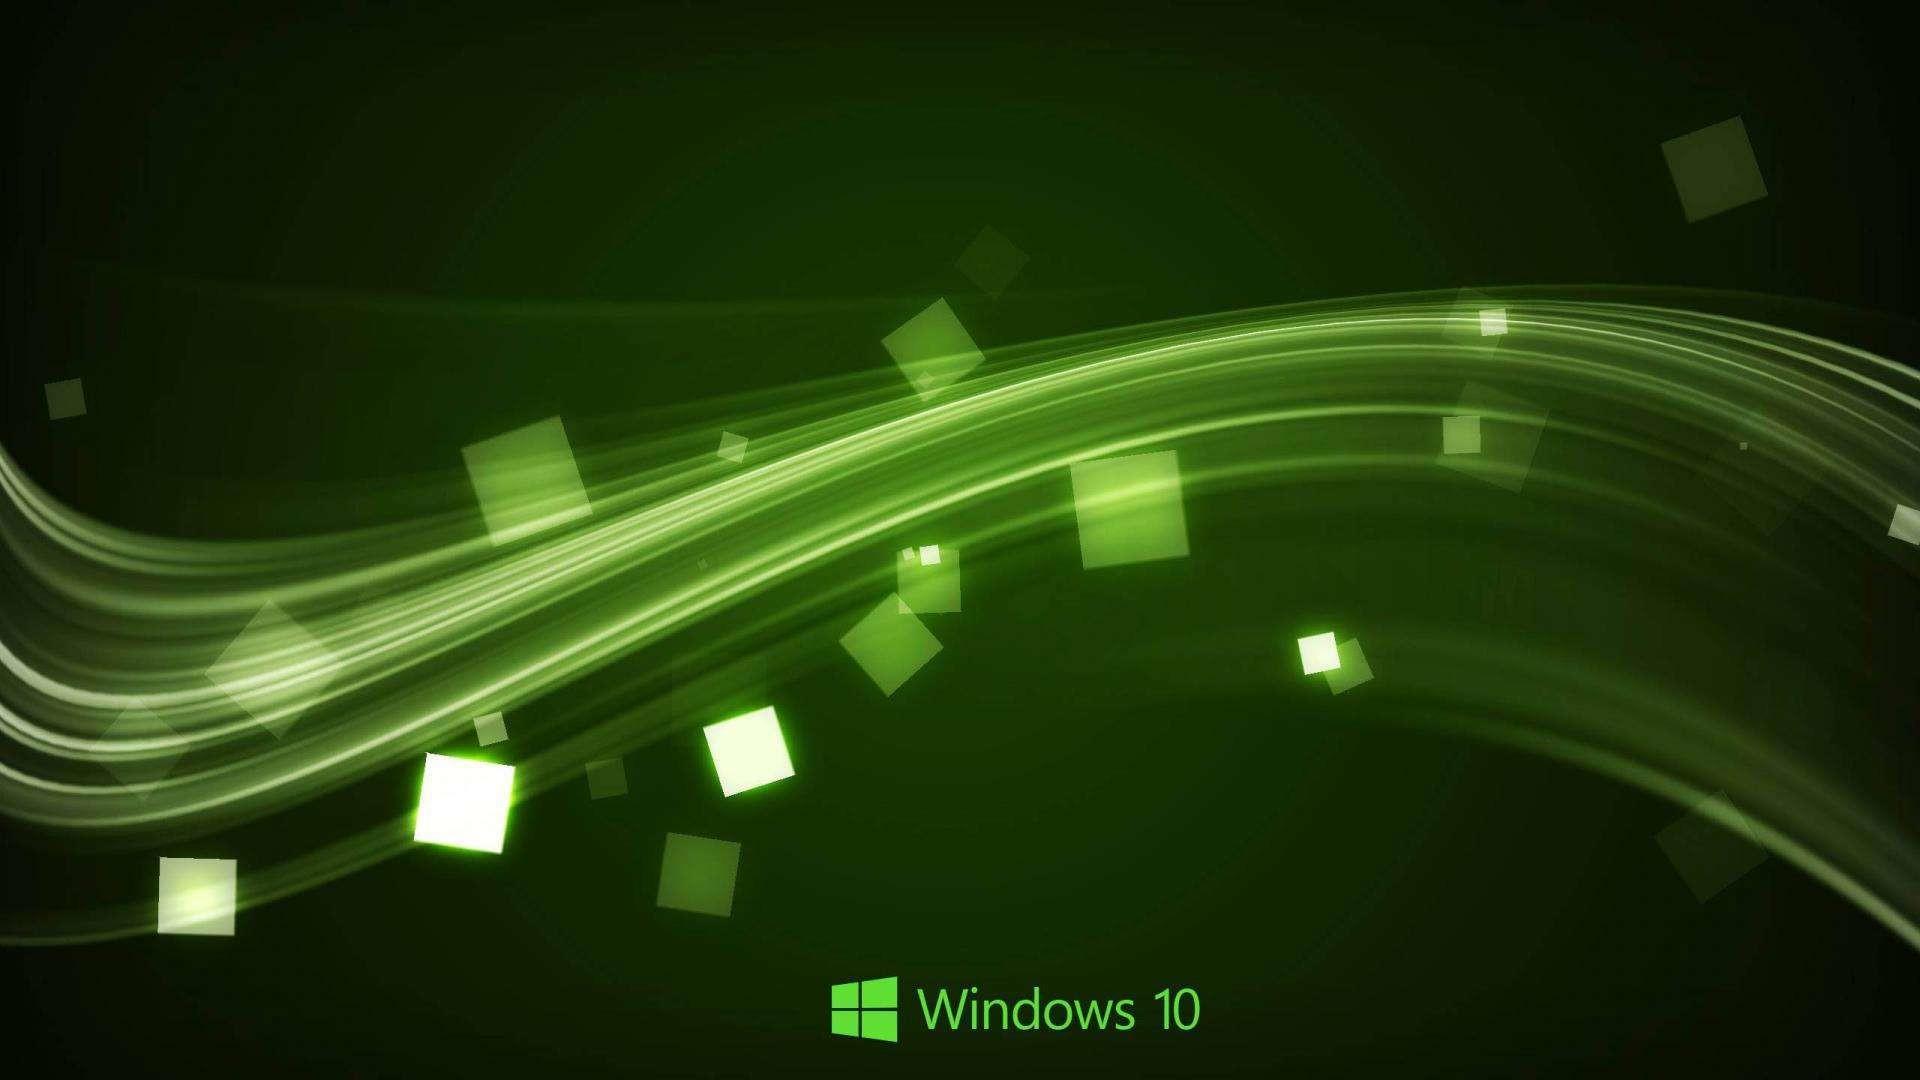 Wallpaper: Windows 10 Hd Wallpaper 1080p. Upload at June 9, 2015 by .